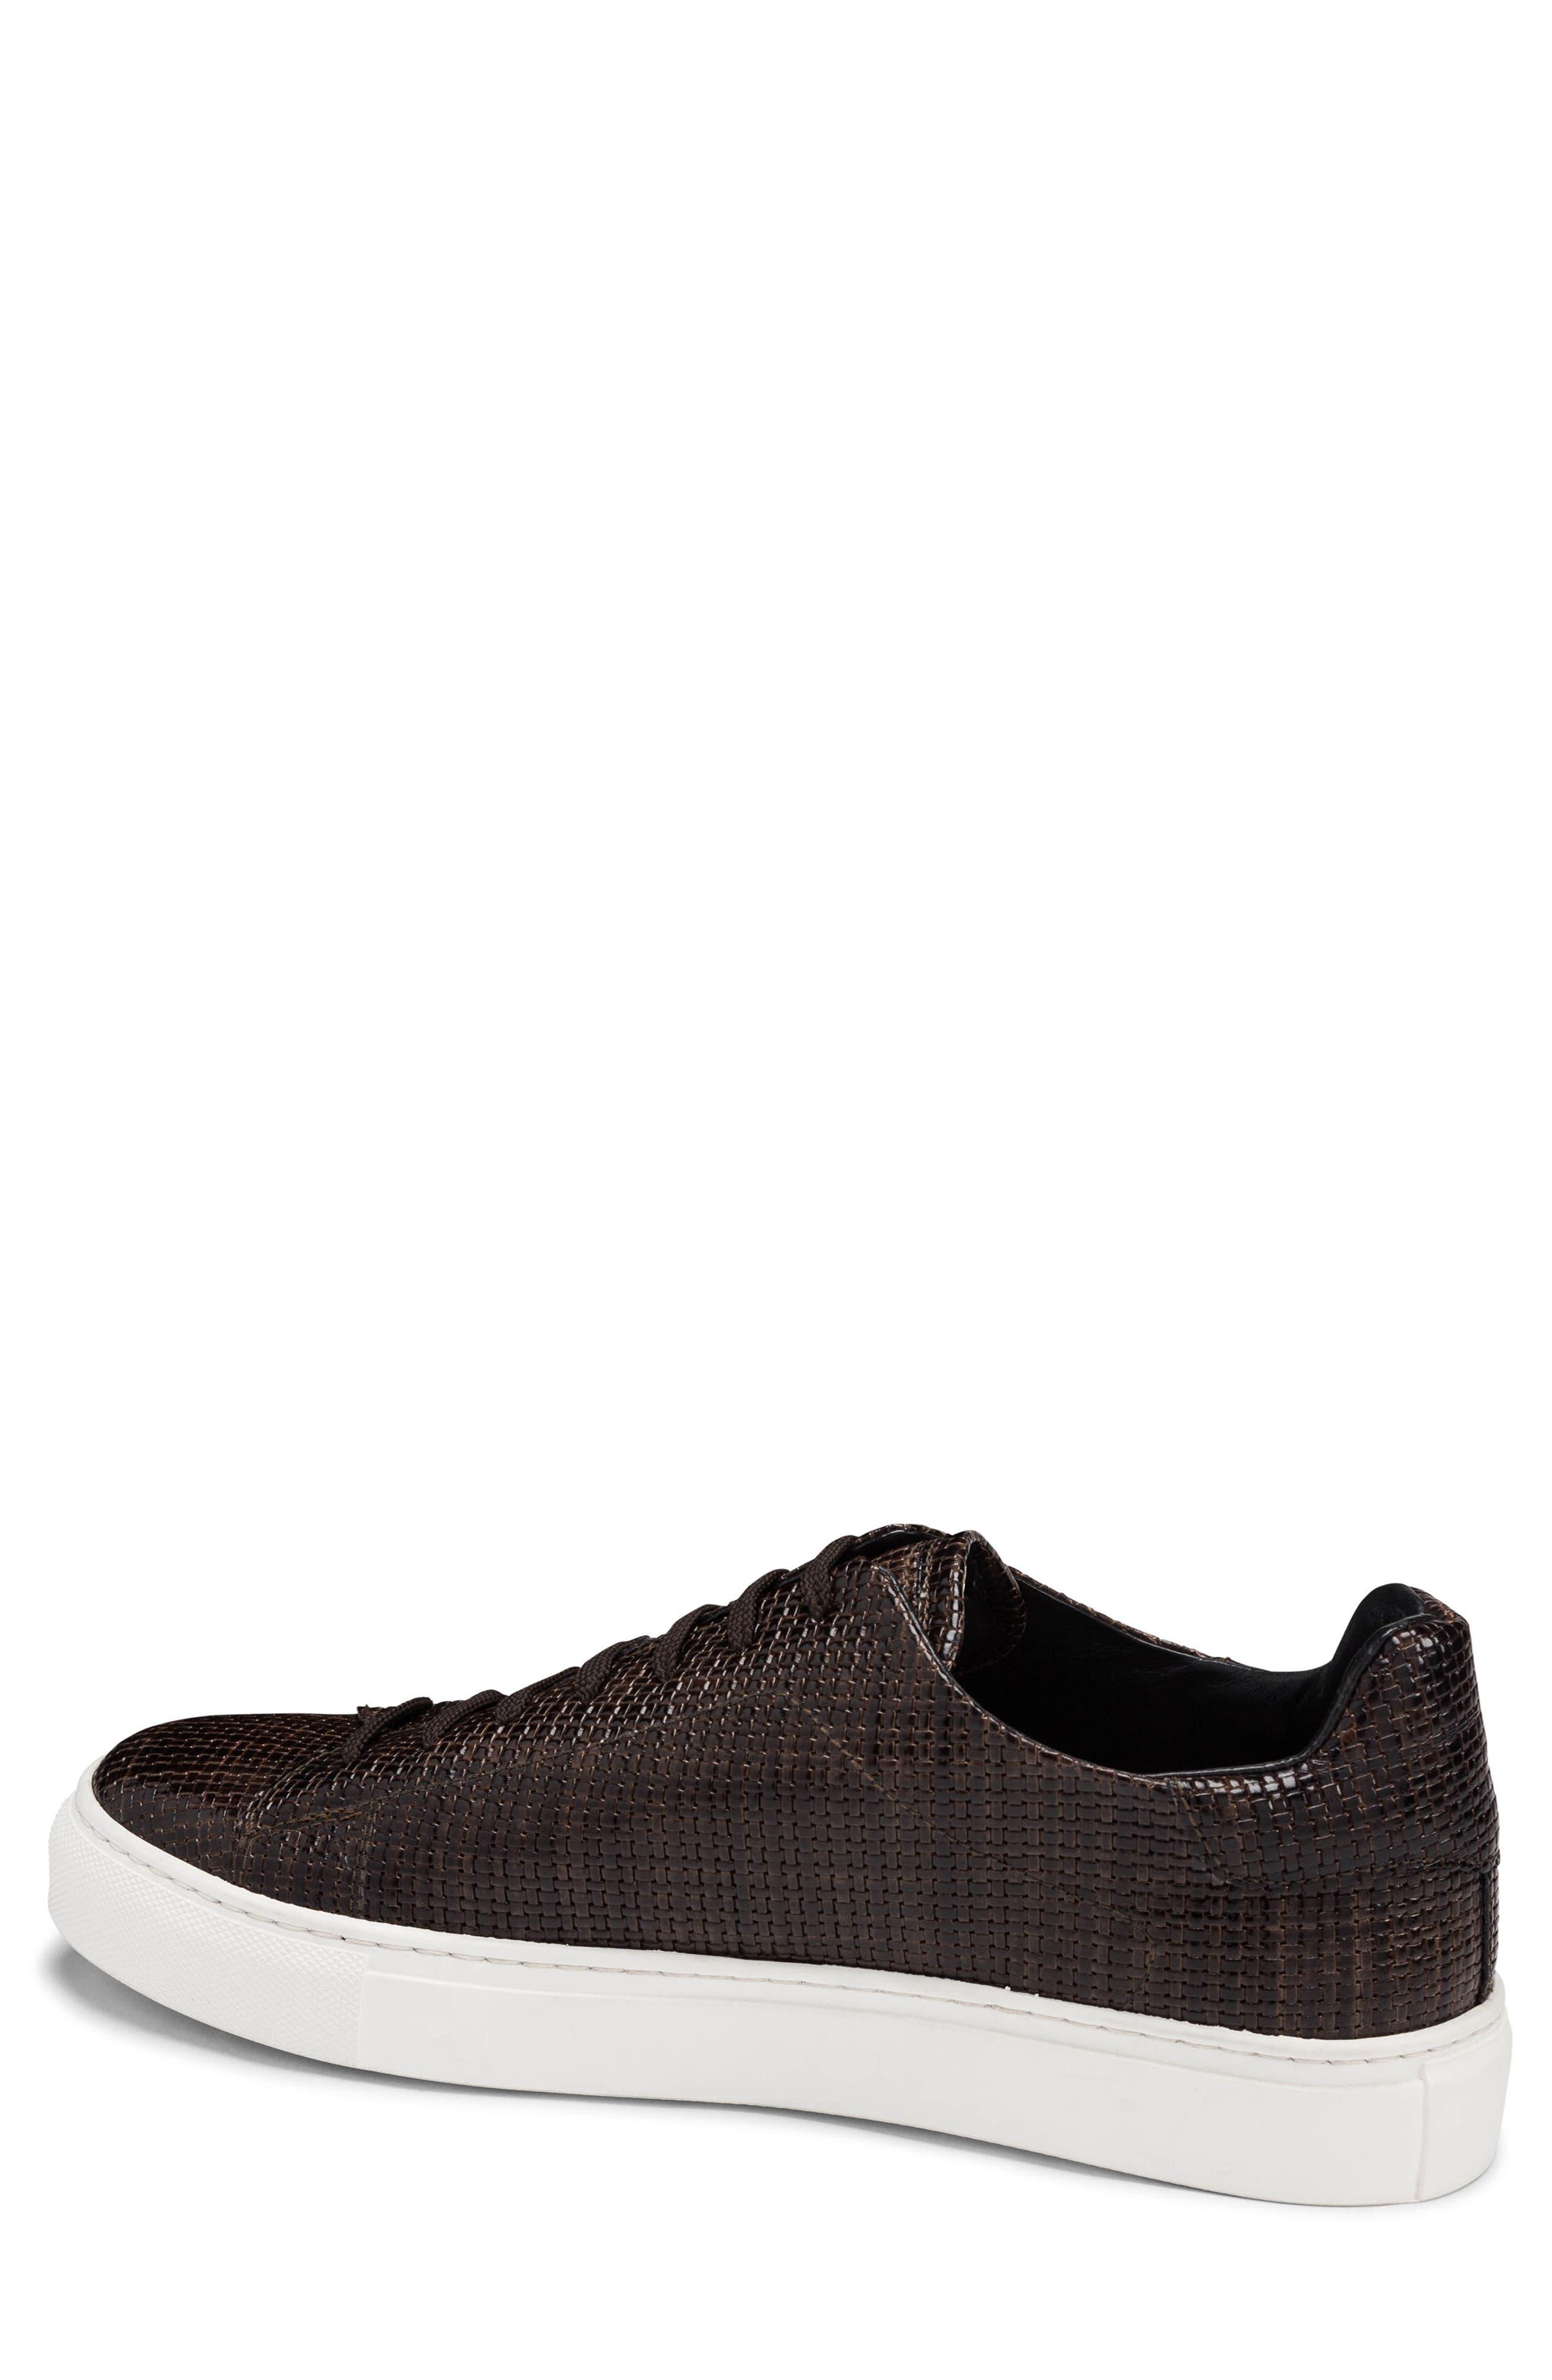 Wimbledon Sneaker,                             Alternate thumbnail 2, color,                             TESTA DI MORO